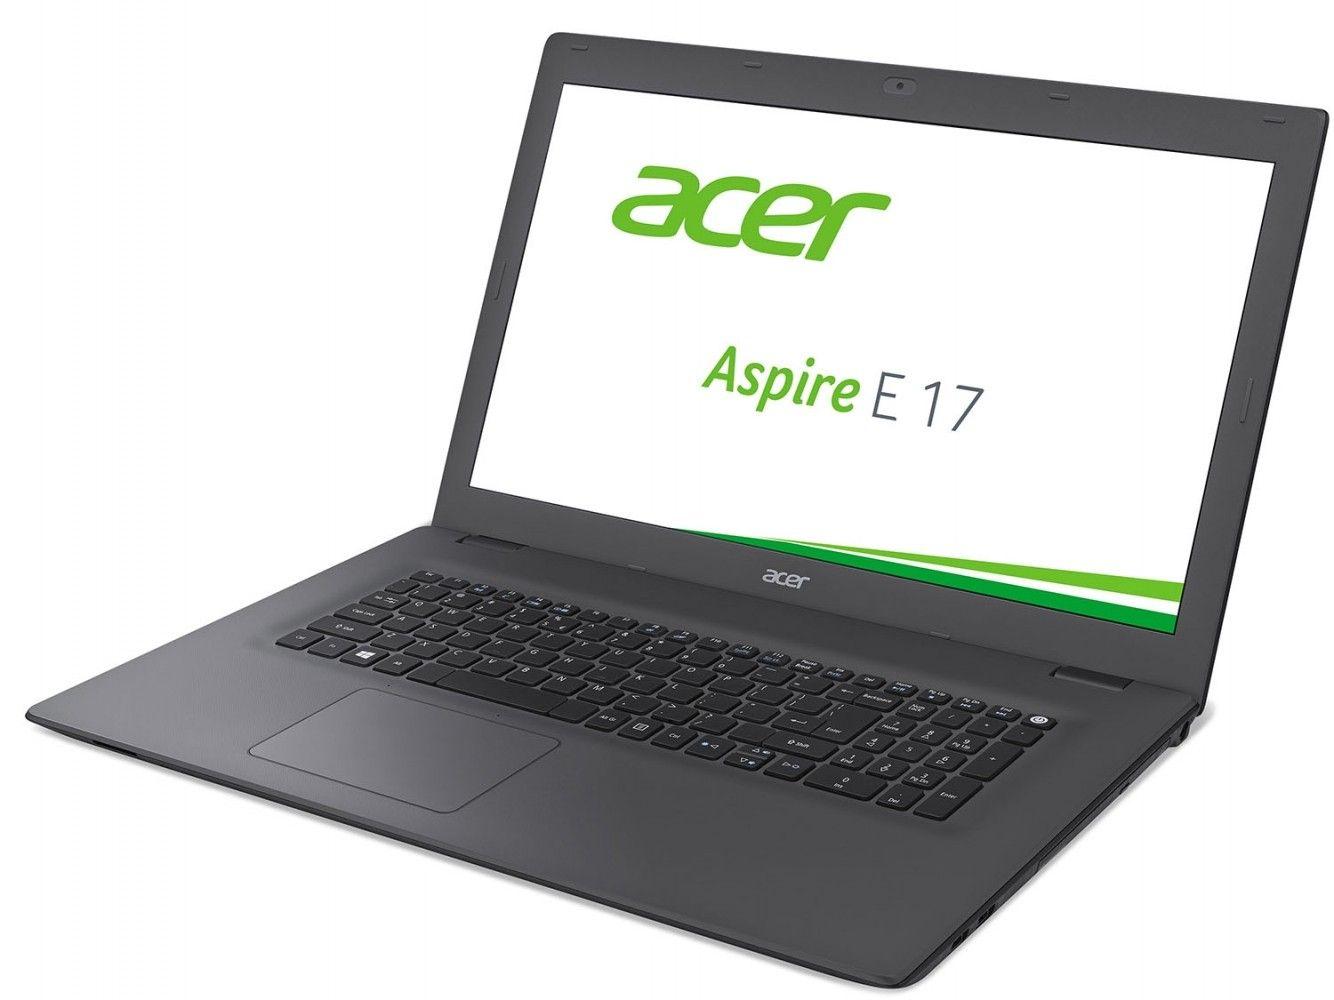 Ноутбук Acer Aspire E5-773G-32N5 (NX.G2AEU.002) Black-Iron - 3